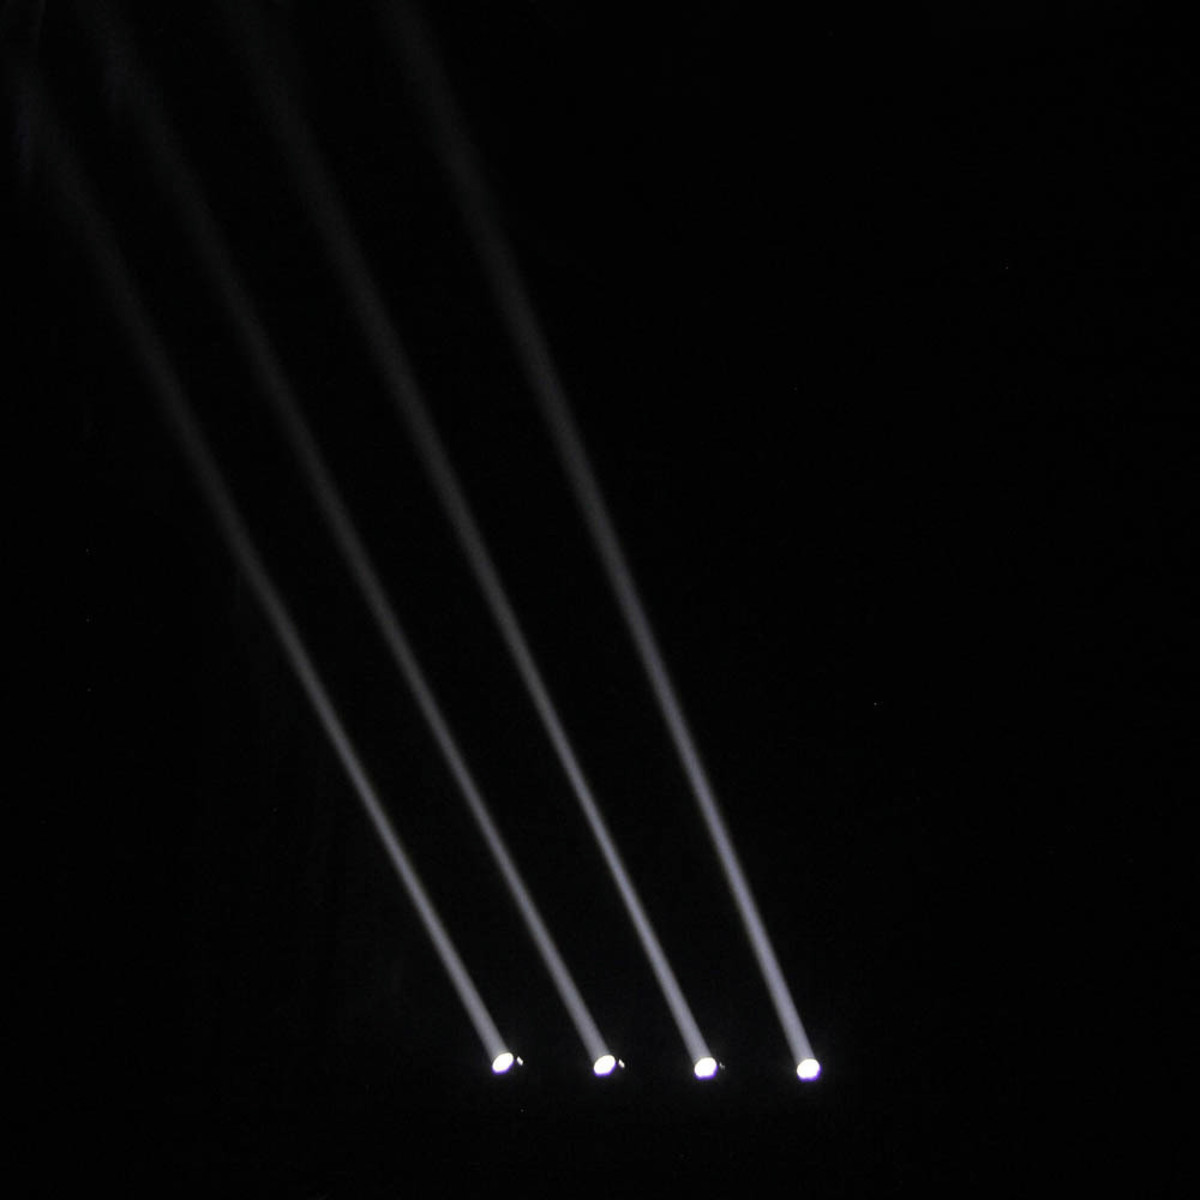 cameo hydrabeam 400w bar with 4 ultra fast moving led cameo hydrabeam 100 rgbw lighting set